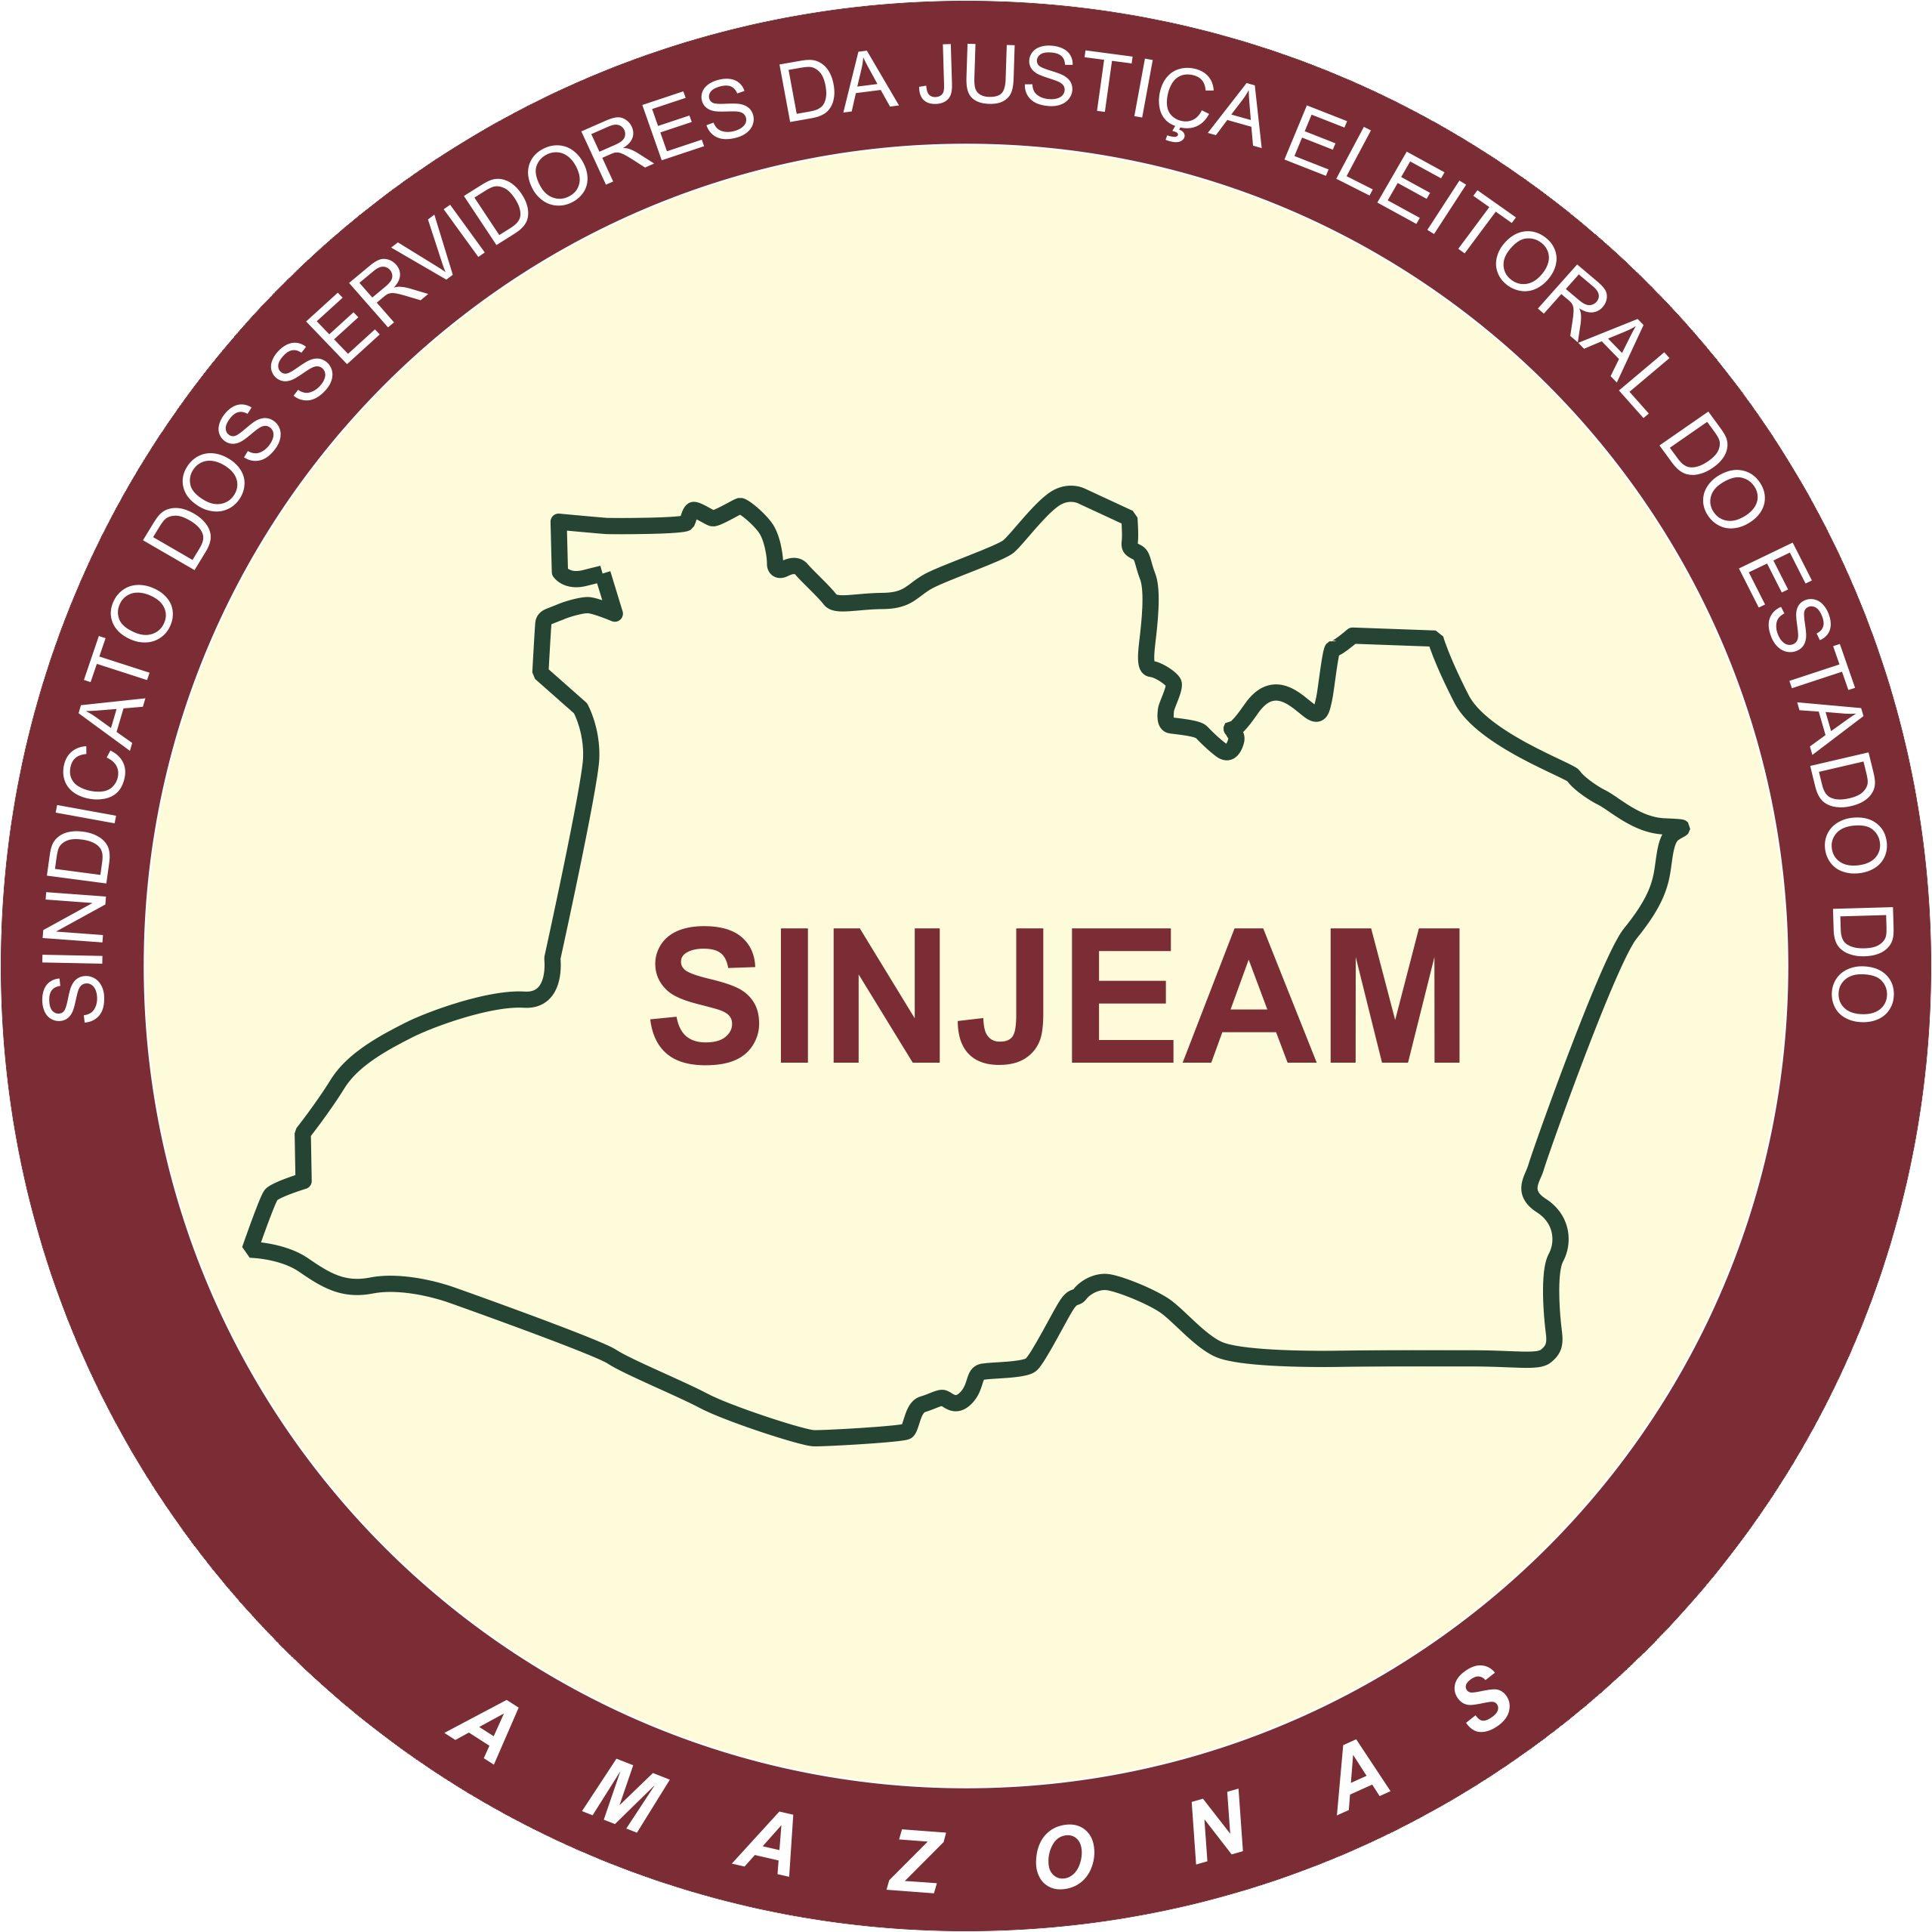 Sindicato dos Servidores da Justiça Eleitoral do Estado do Amazonas